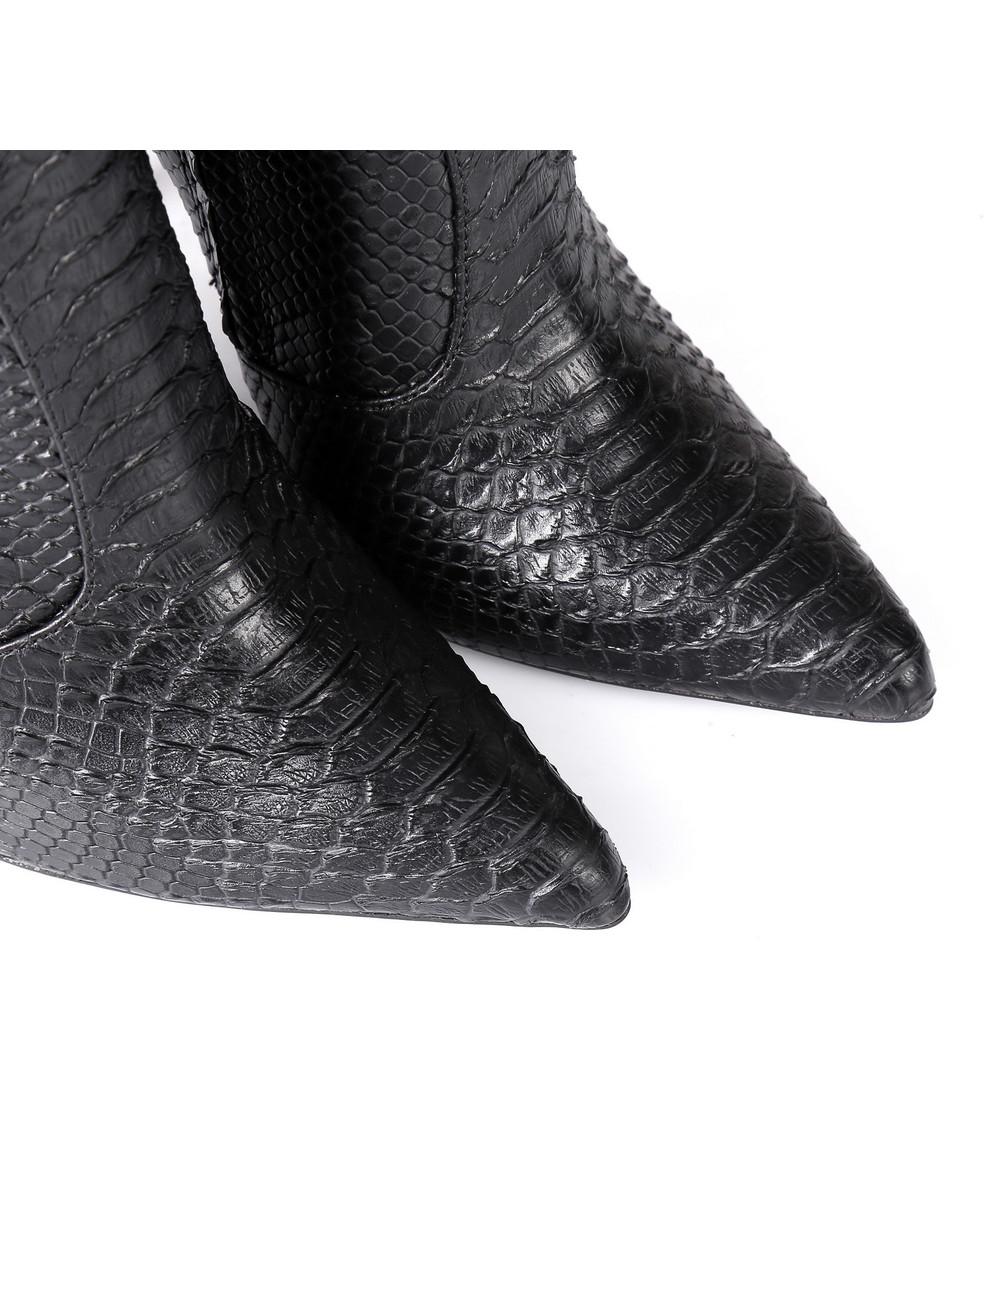 Giaro ZIRA | SNAKE BLACK | KNEE BOOTS | Italian Style -OUTLET